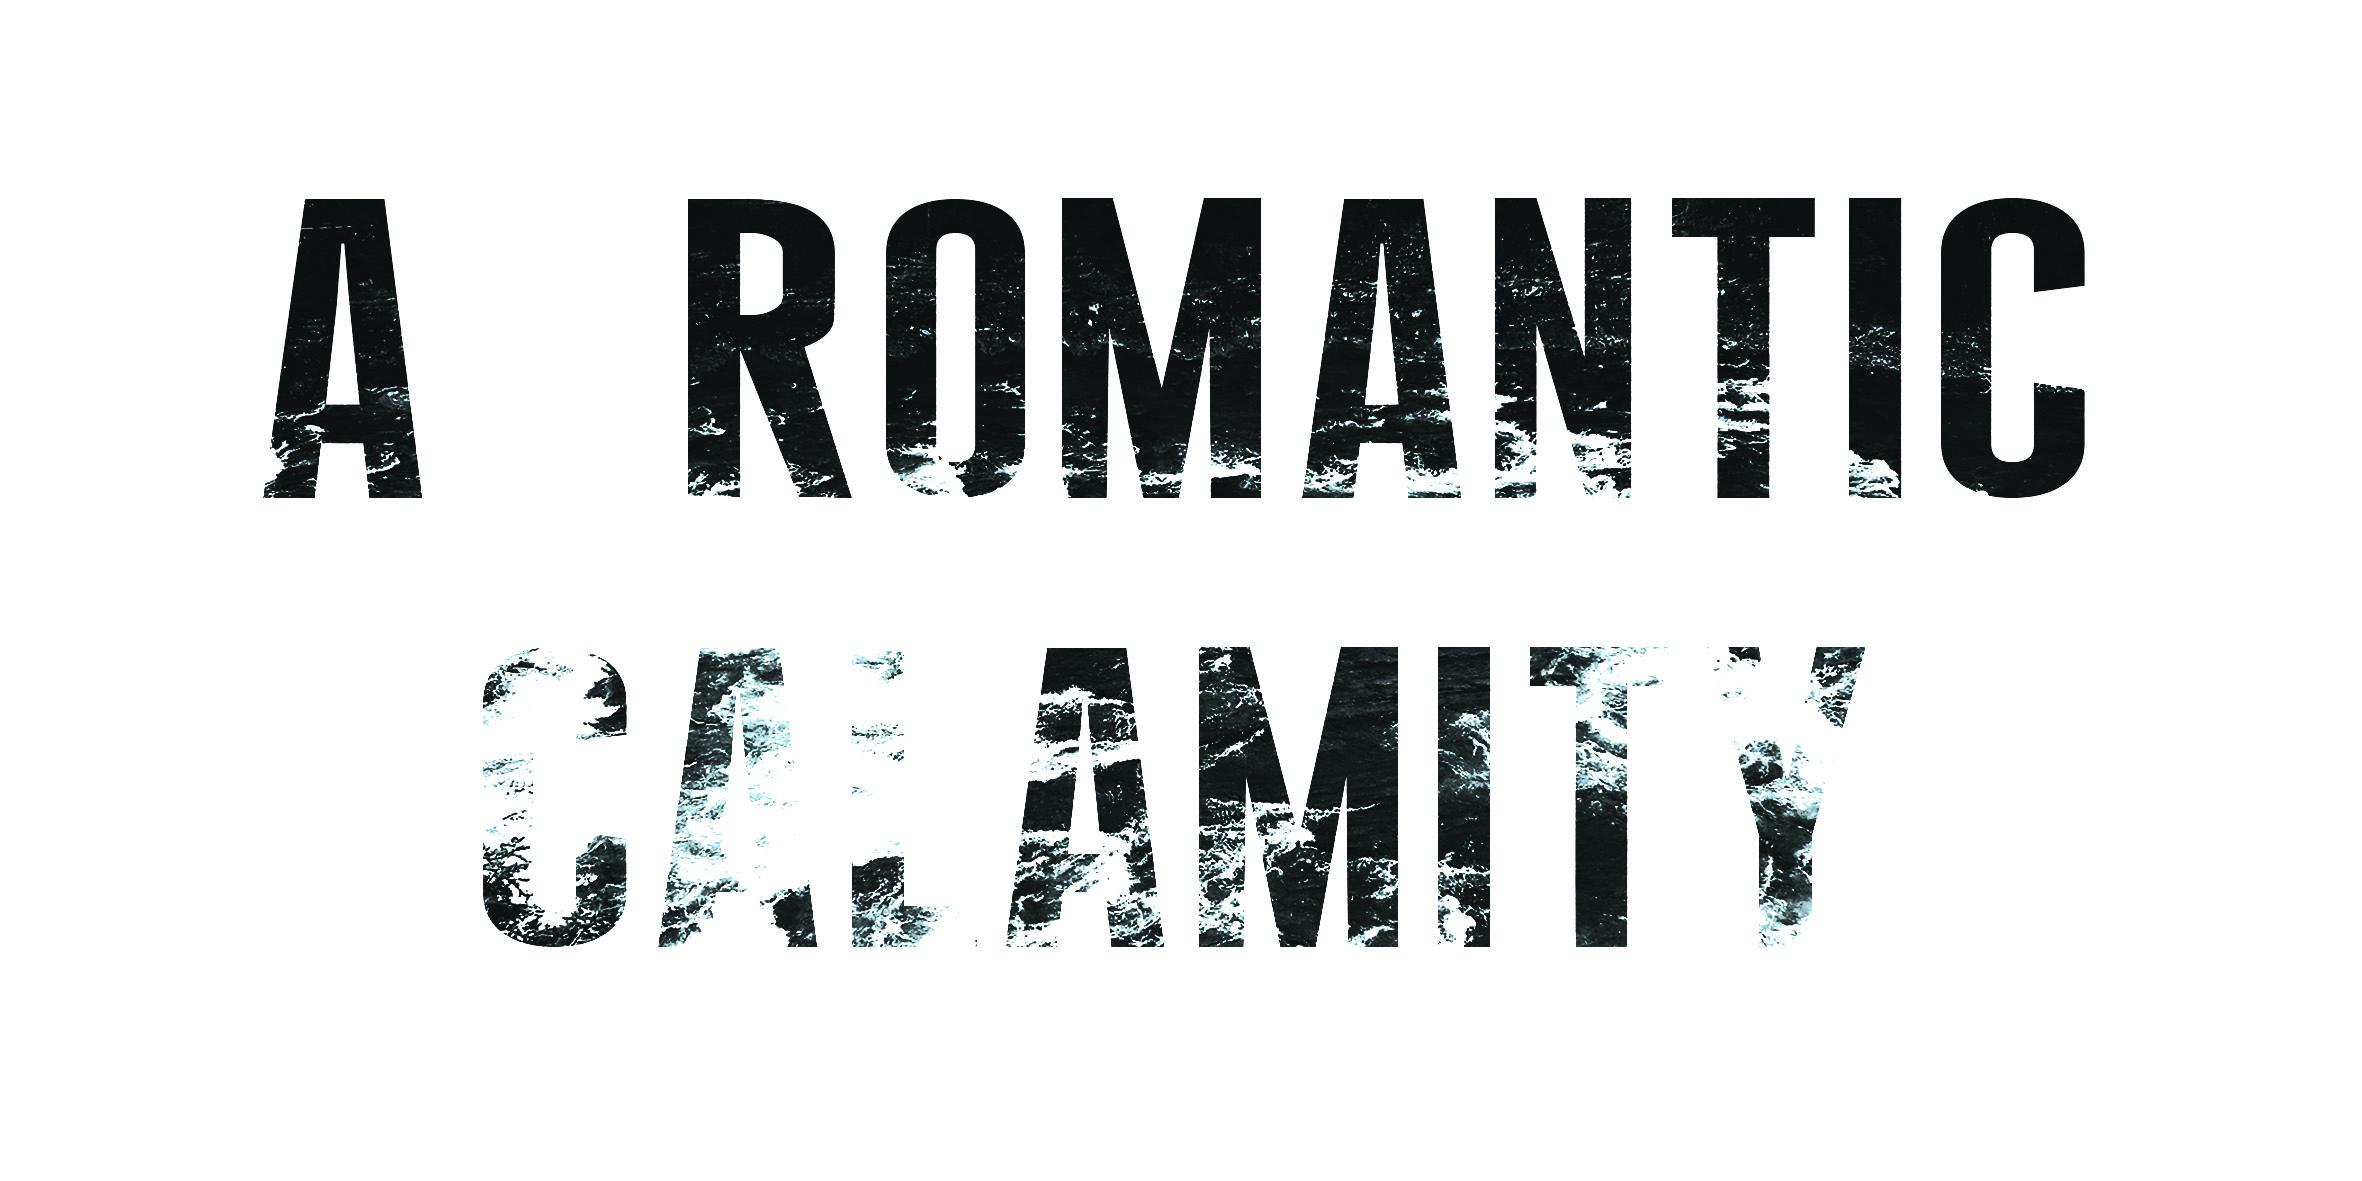 A Romantic Calamity